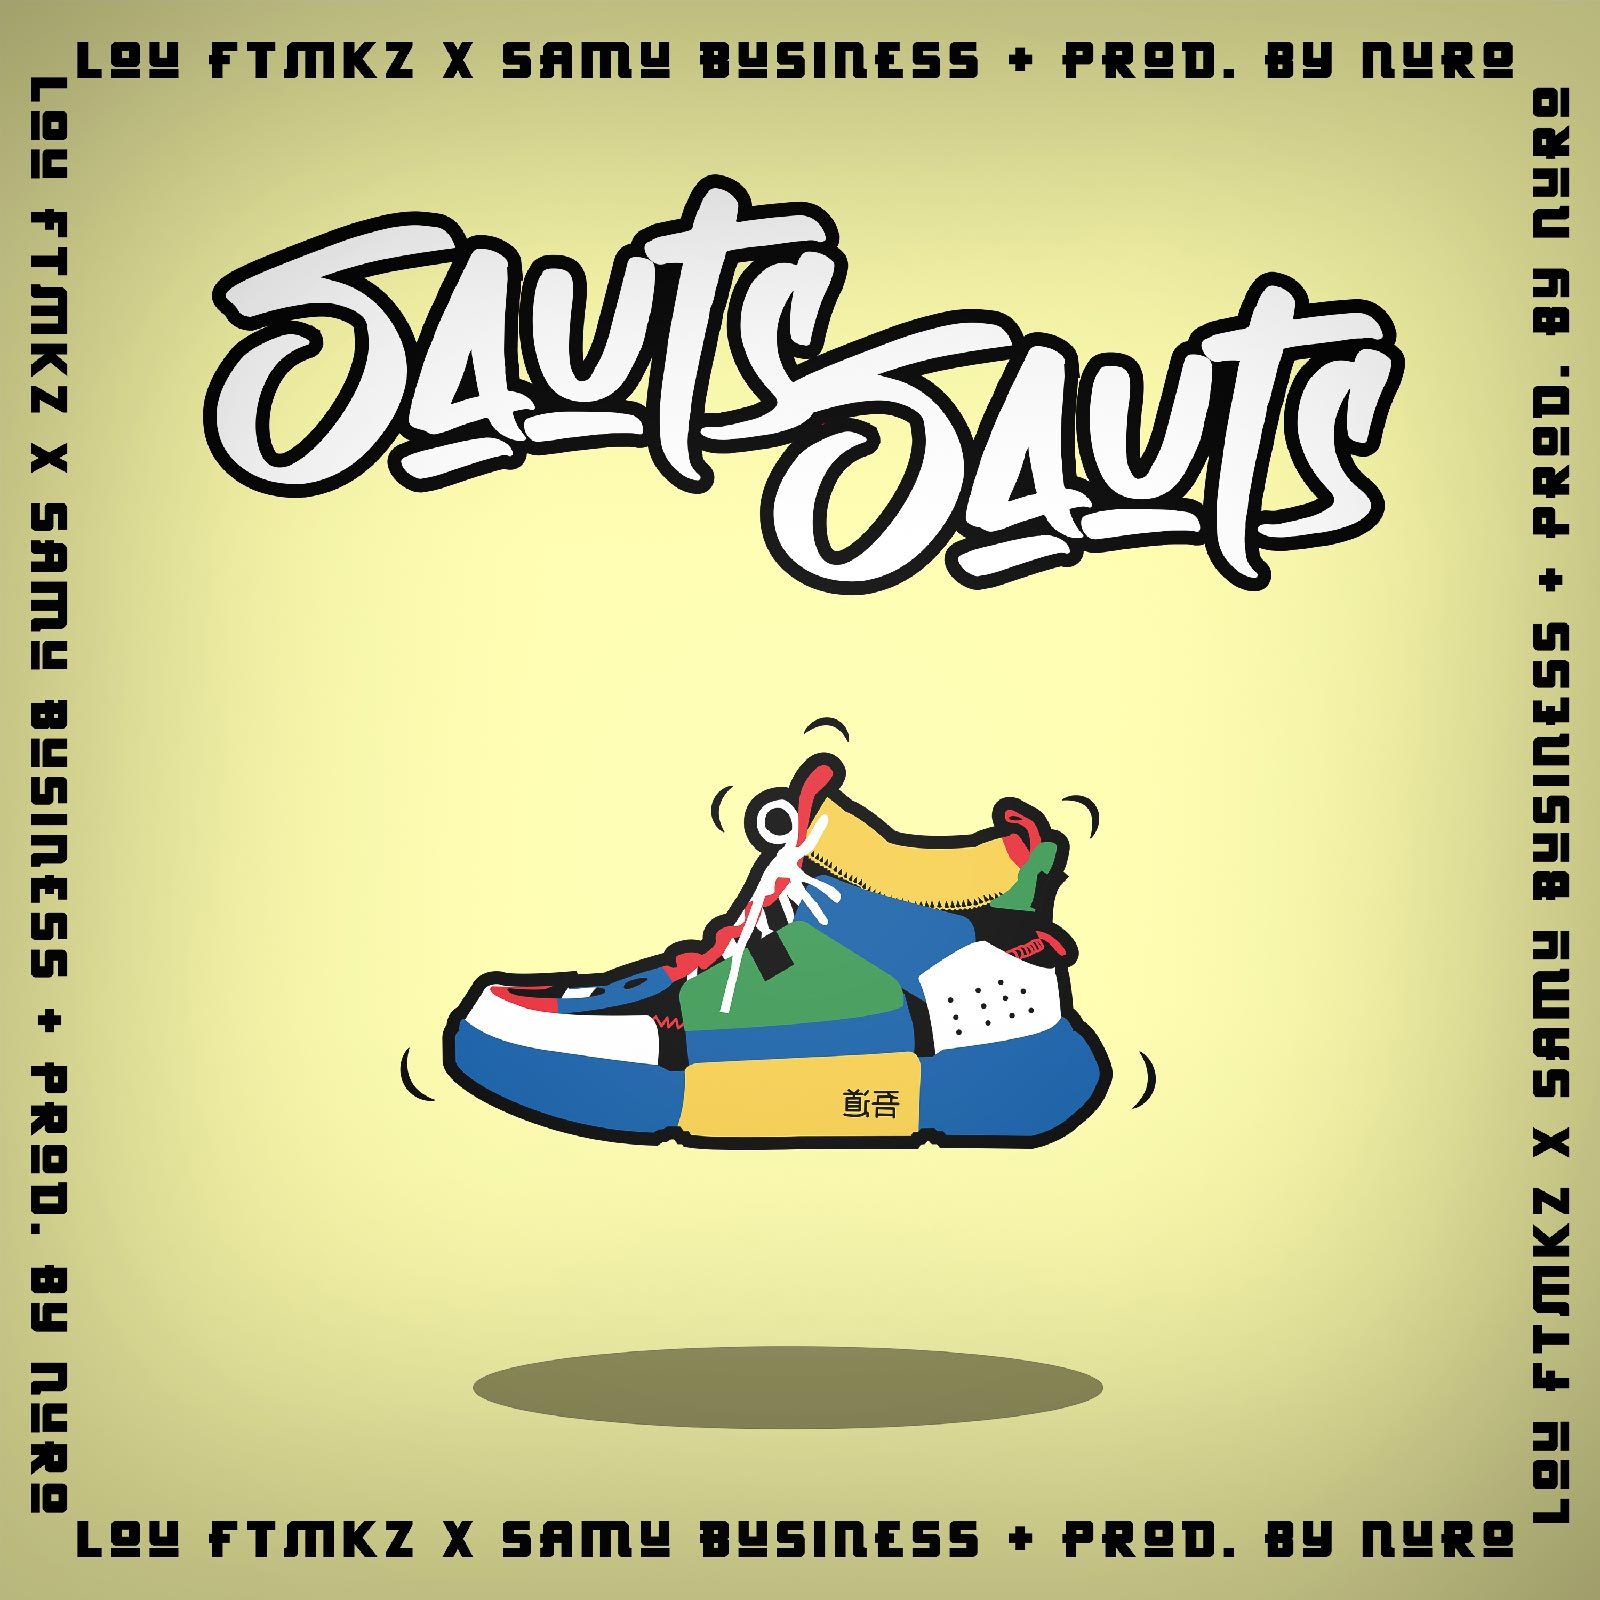 Upcoming: Lou FTMKZ, Samu Business, Nuro - Sauts Sauts